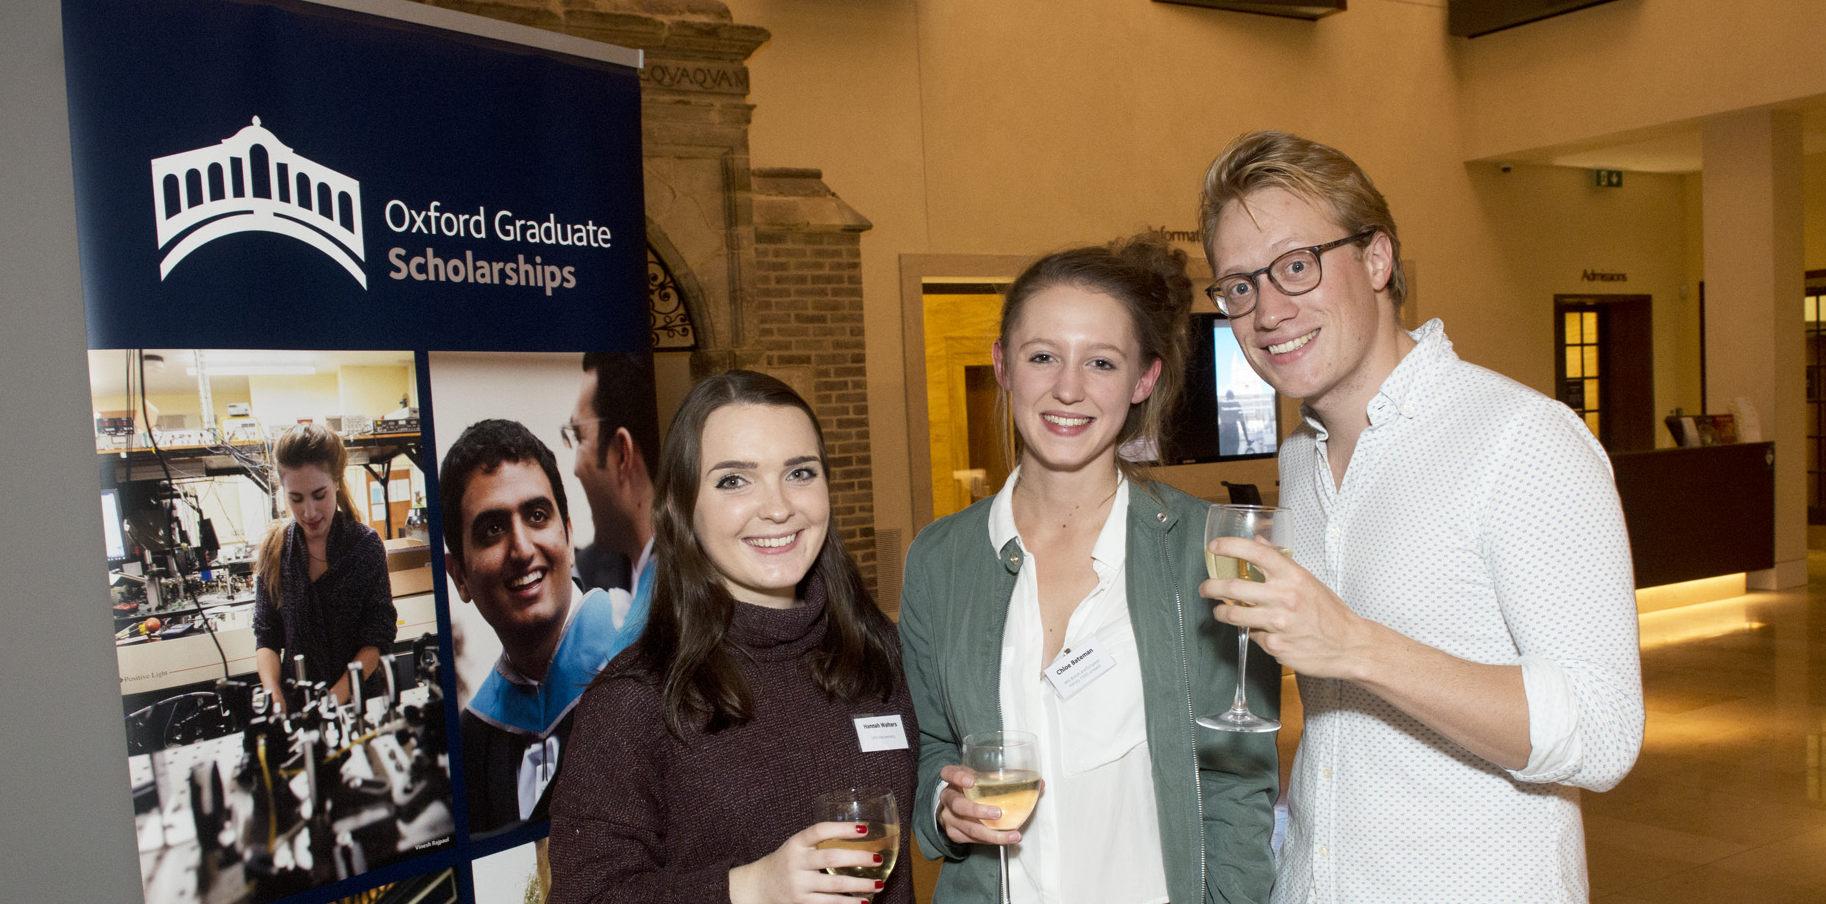 Celebration marks postgraduate scholarship fundraising progress